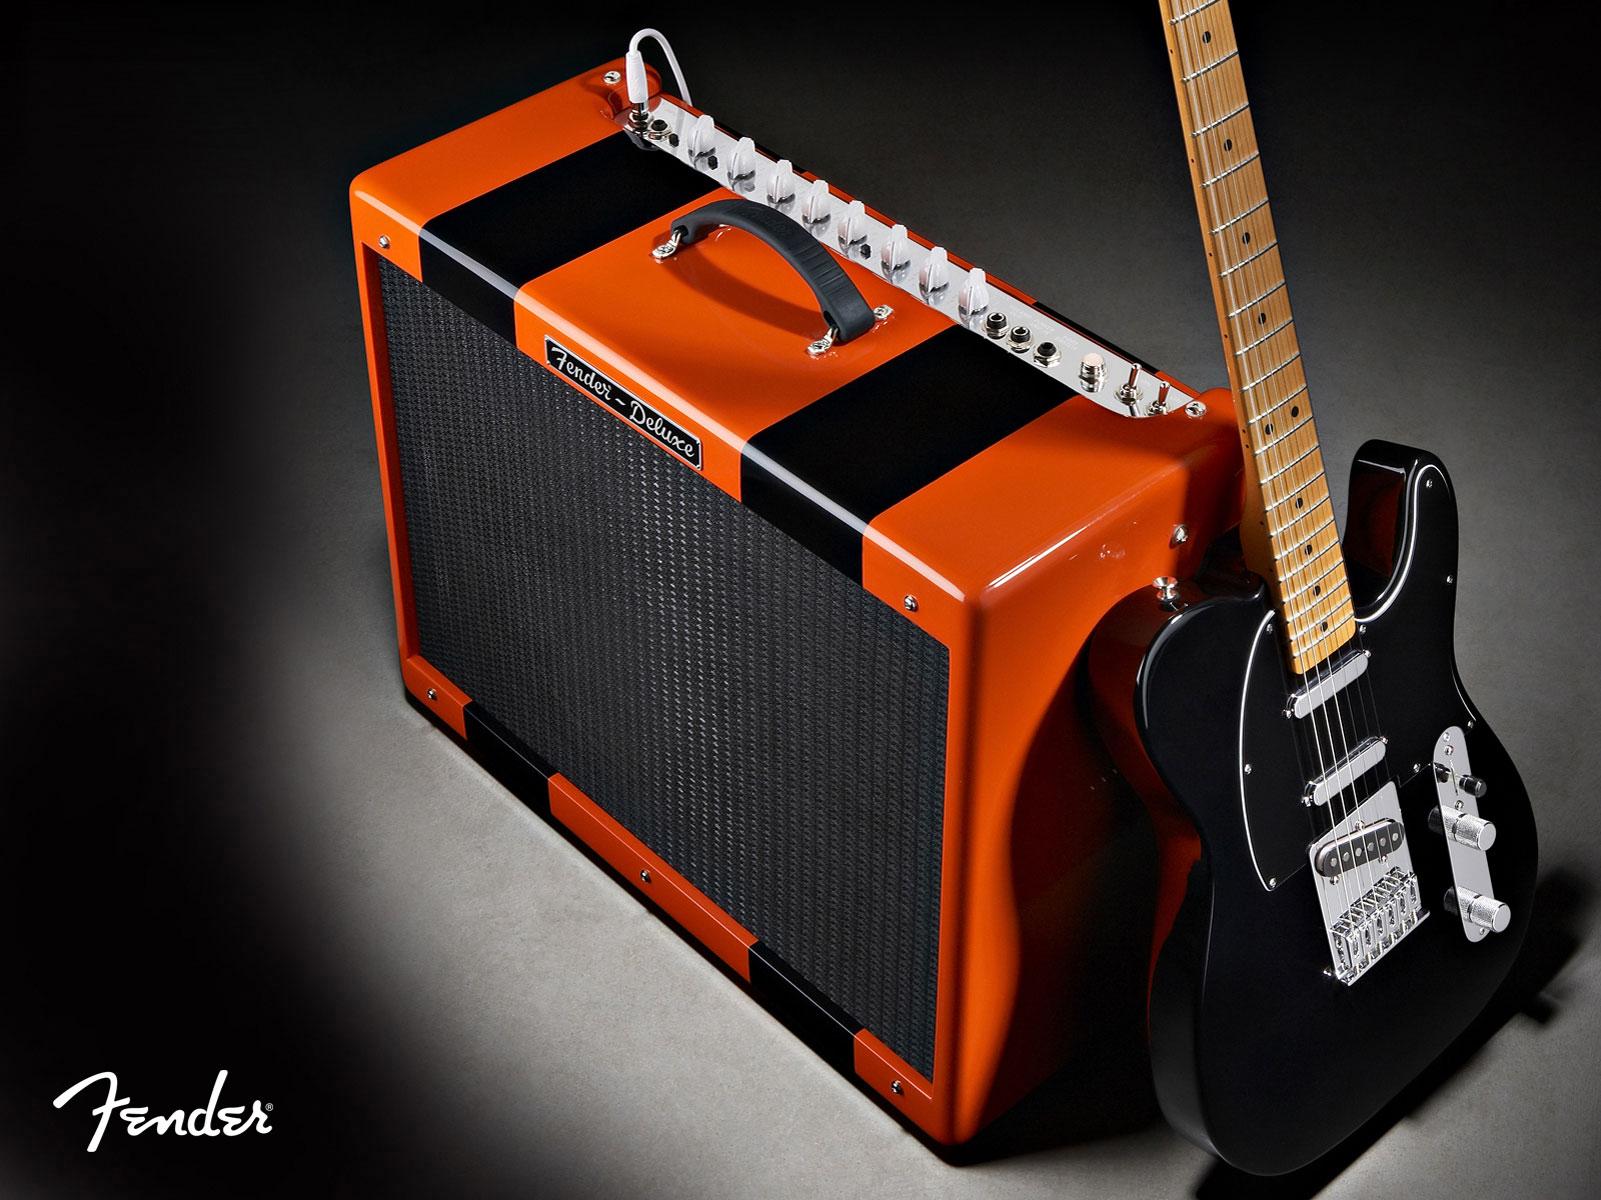 Fender Telecaster wallpaper by cmdry72 1601x1200